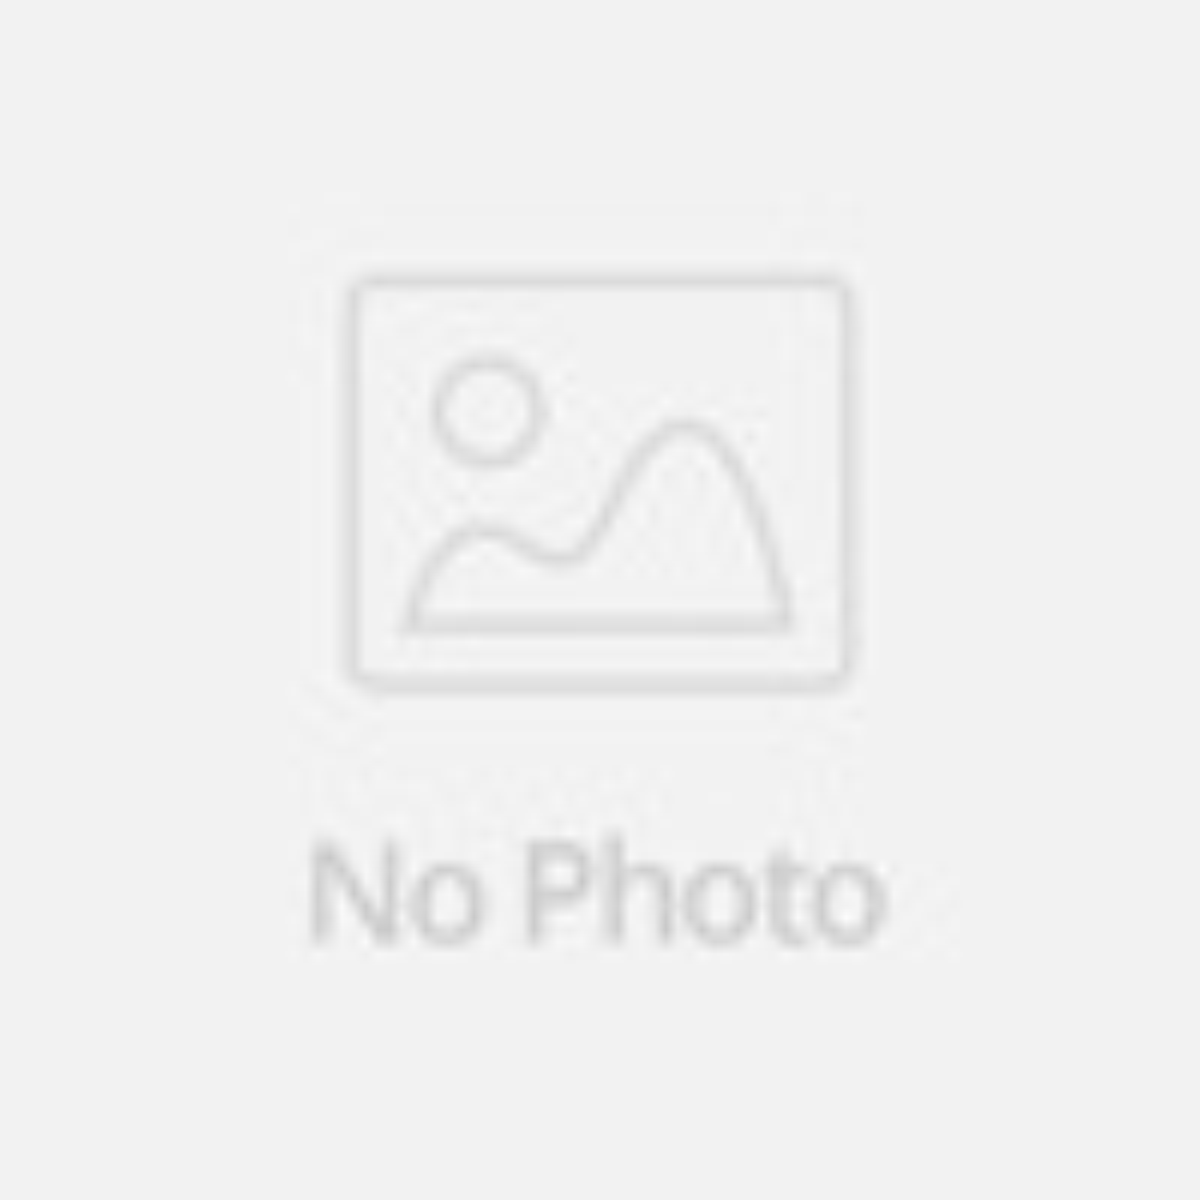 Super Powerful Strong Rare Earth Block NdFeB Magnet Neodymium N50 Magnets 30mm x 20mm x 10mm N50(China (Mainland))